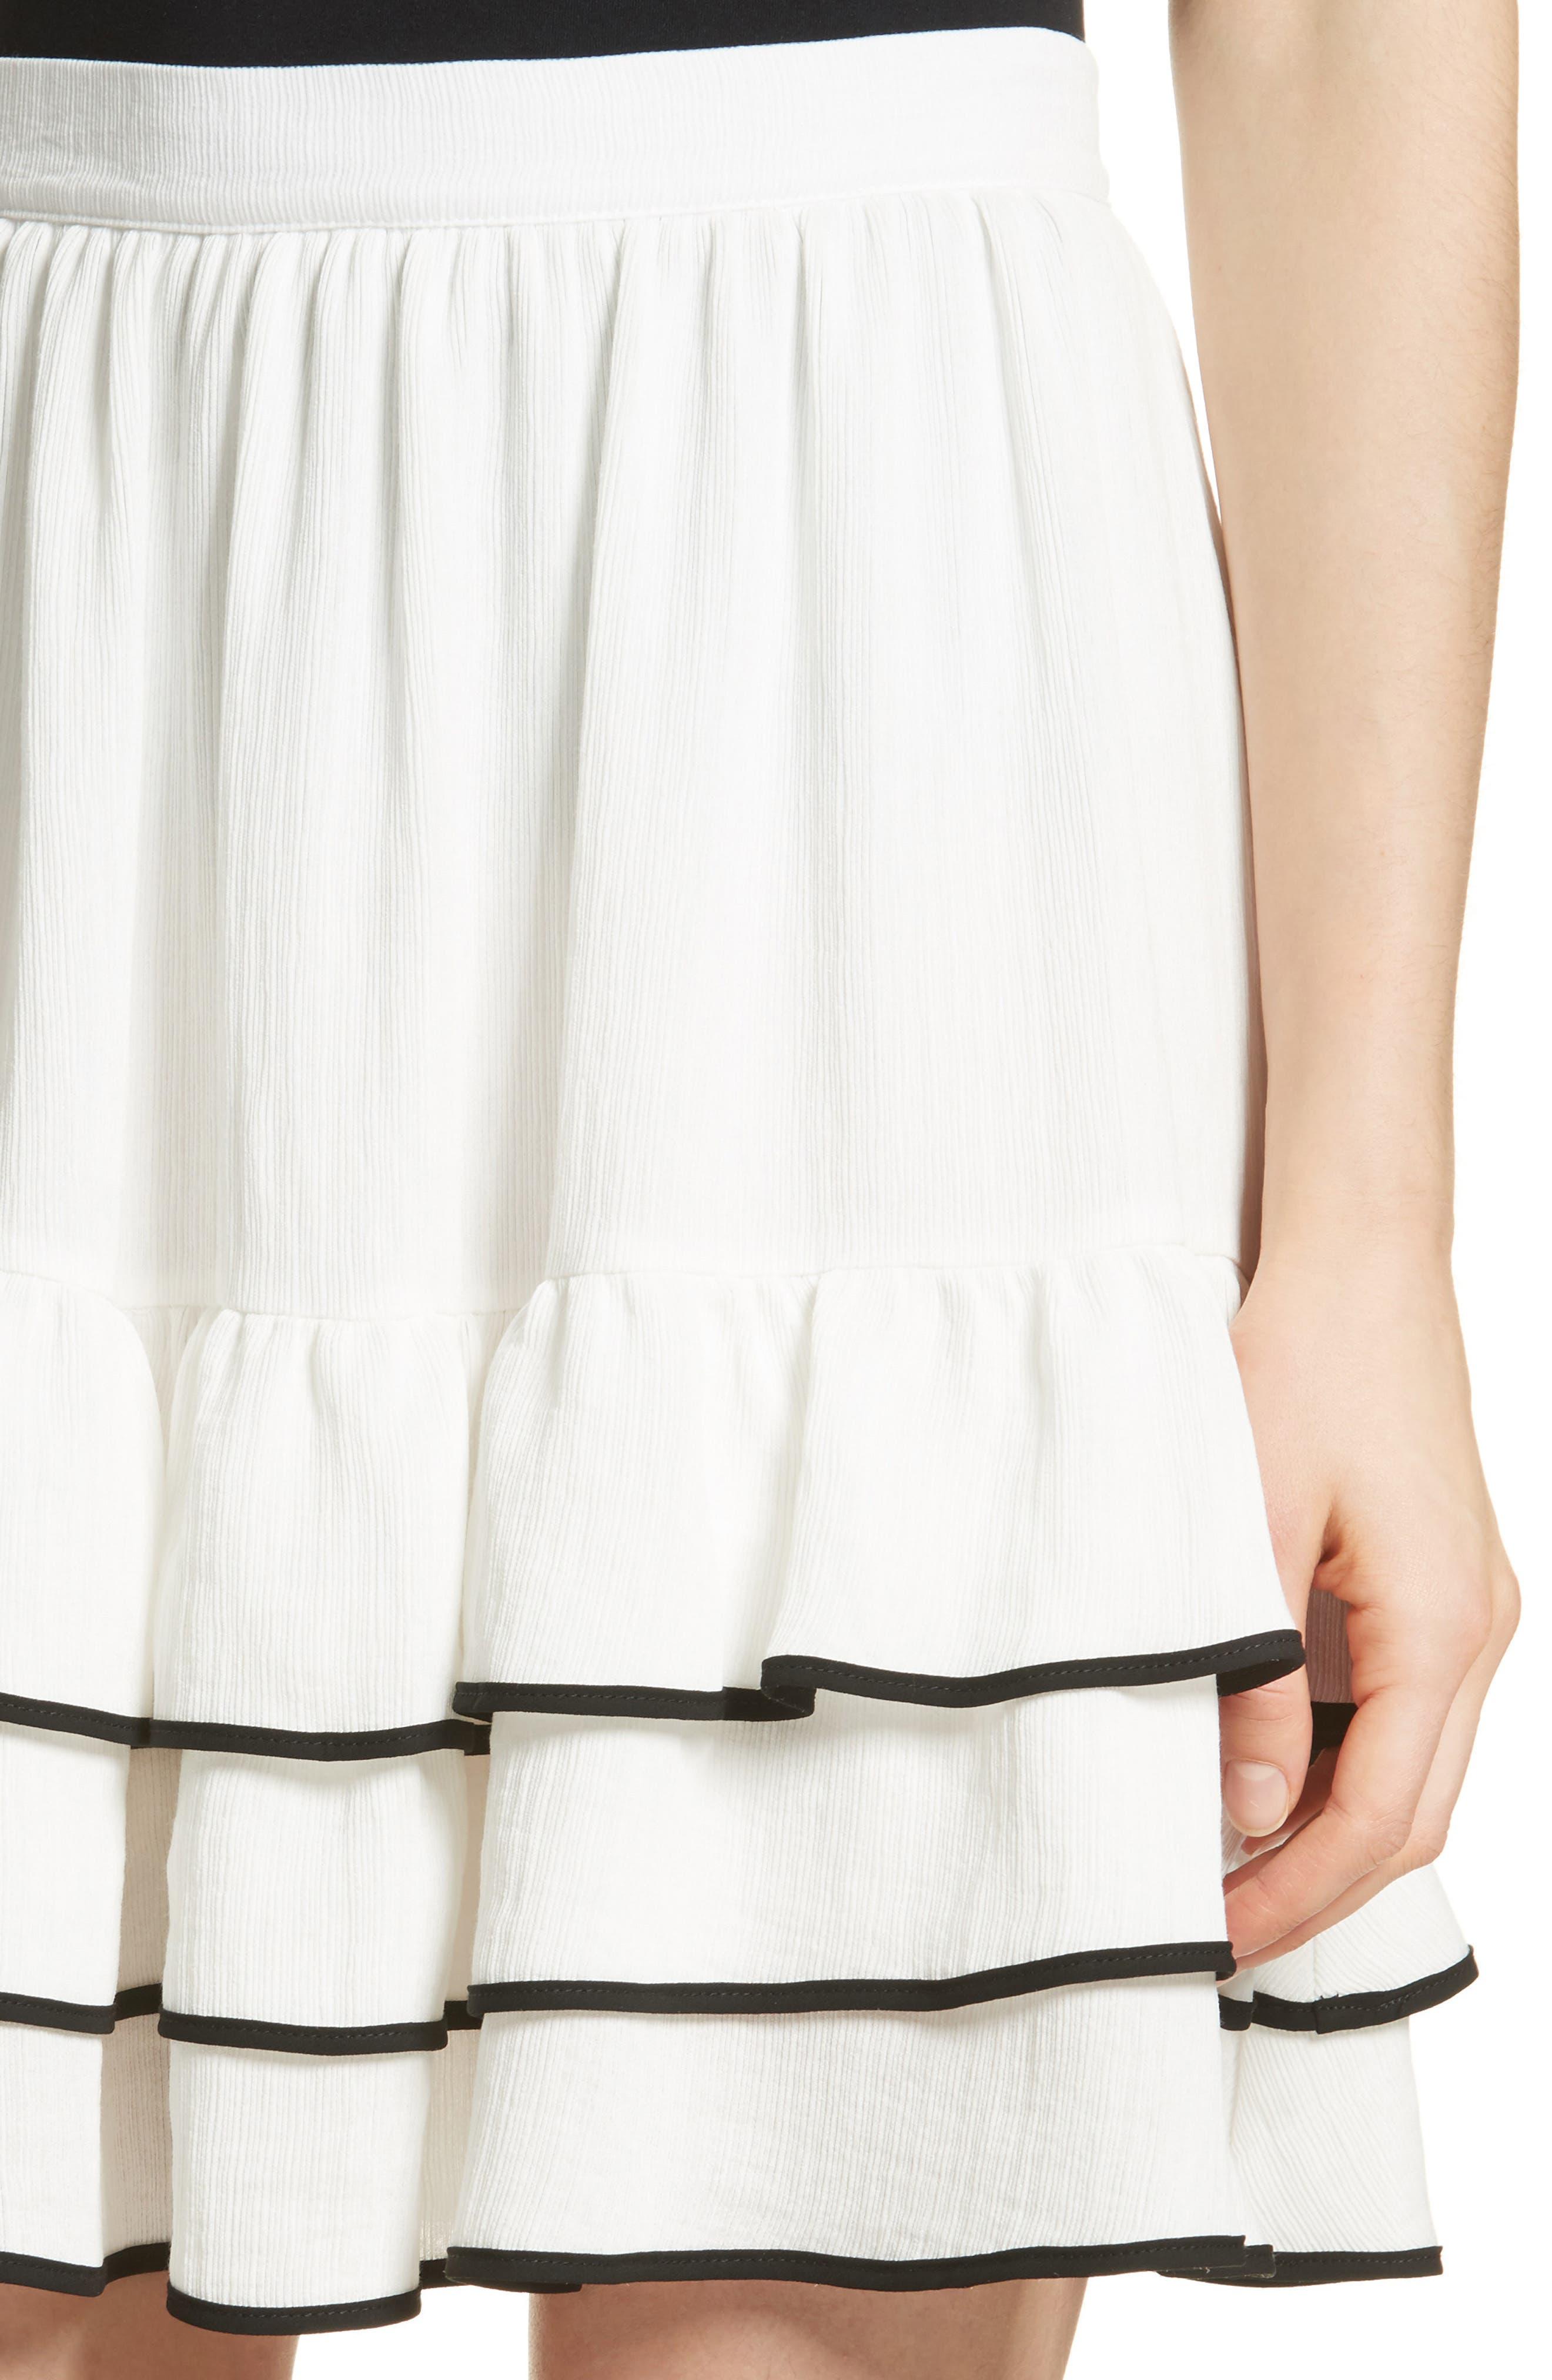 Prose & Poetry Carice Ruffle Miniskirt,                             Alternate thumbnail 4, color,                             Alabaster